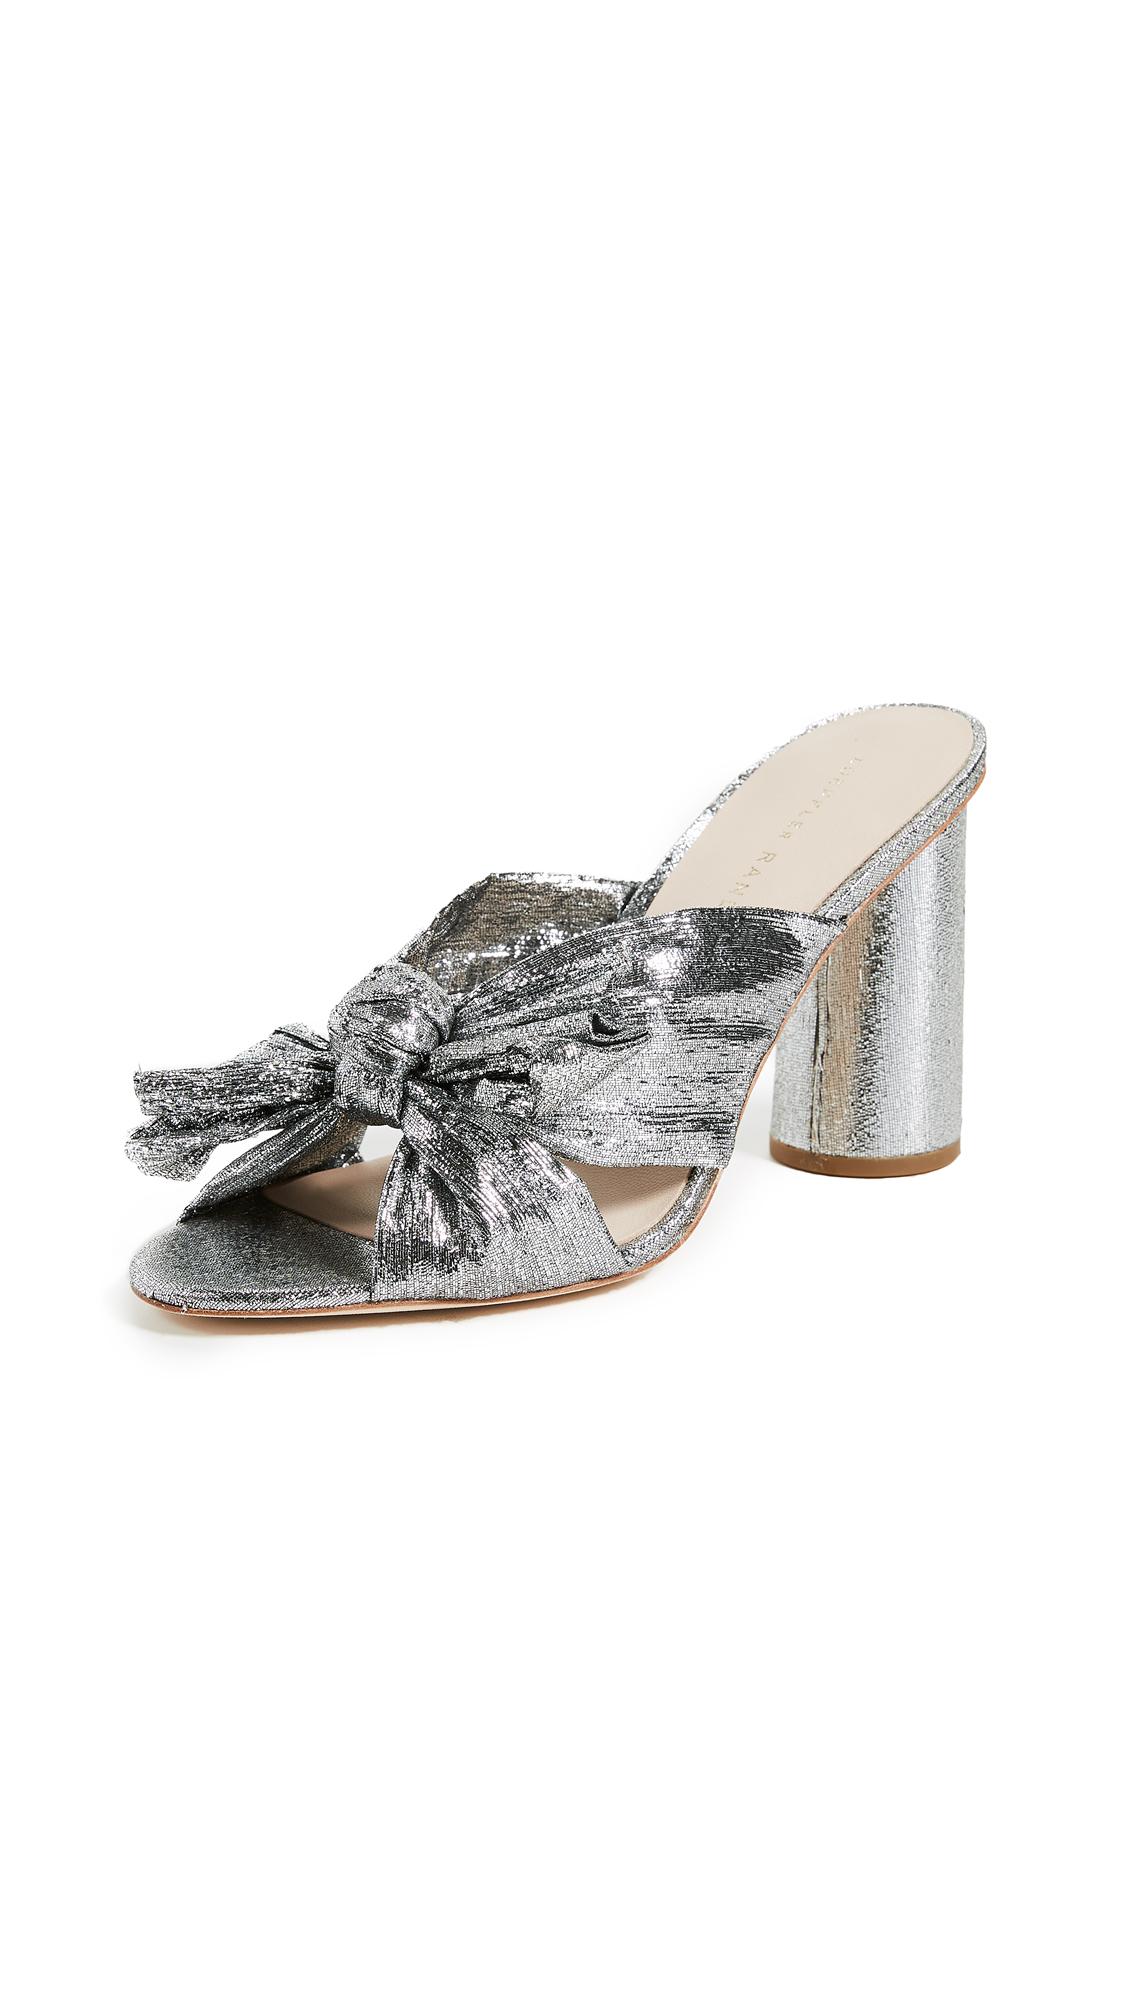 LOEFFLER RANDALL Penny Knot Strap Slide Sandals Silver